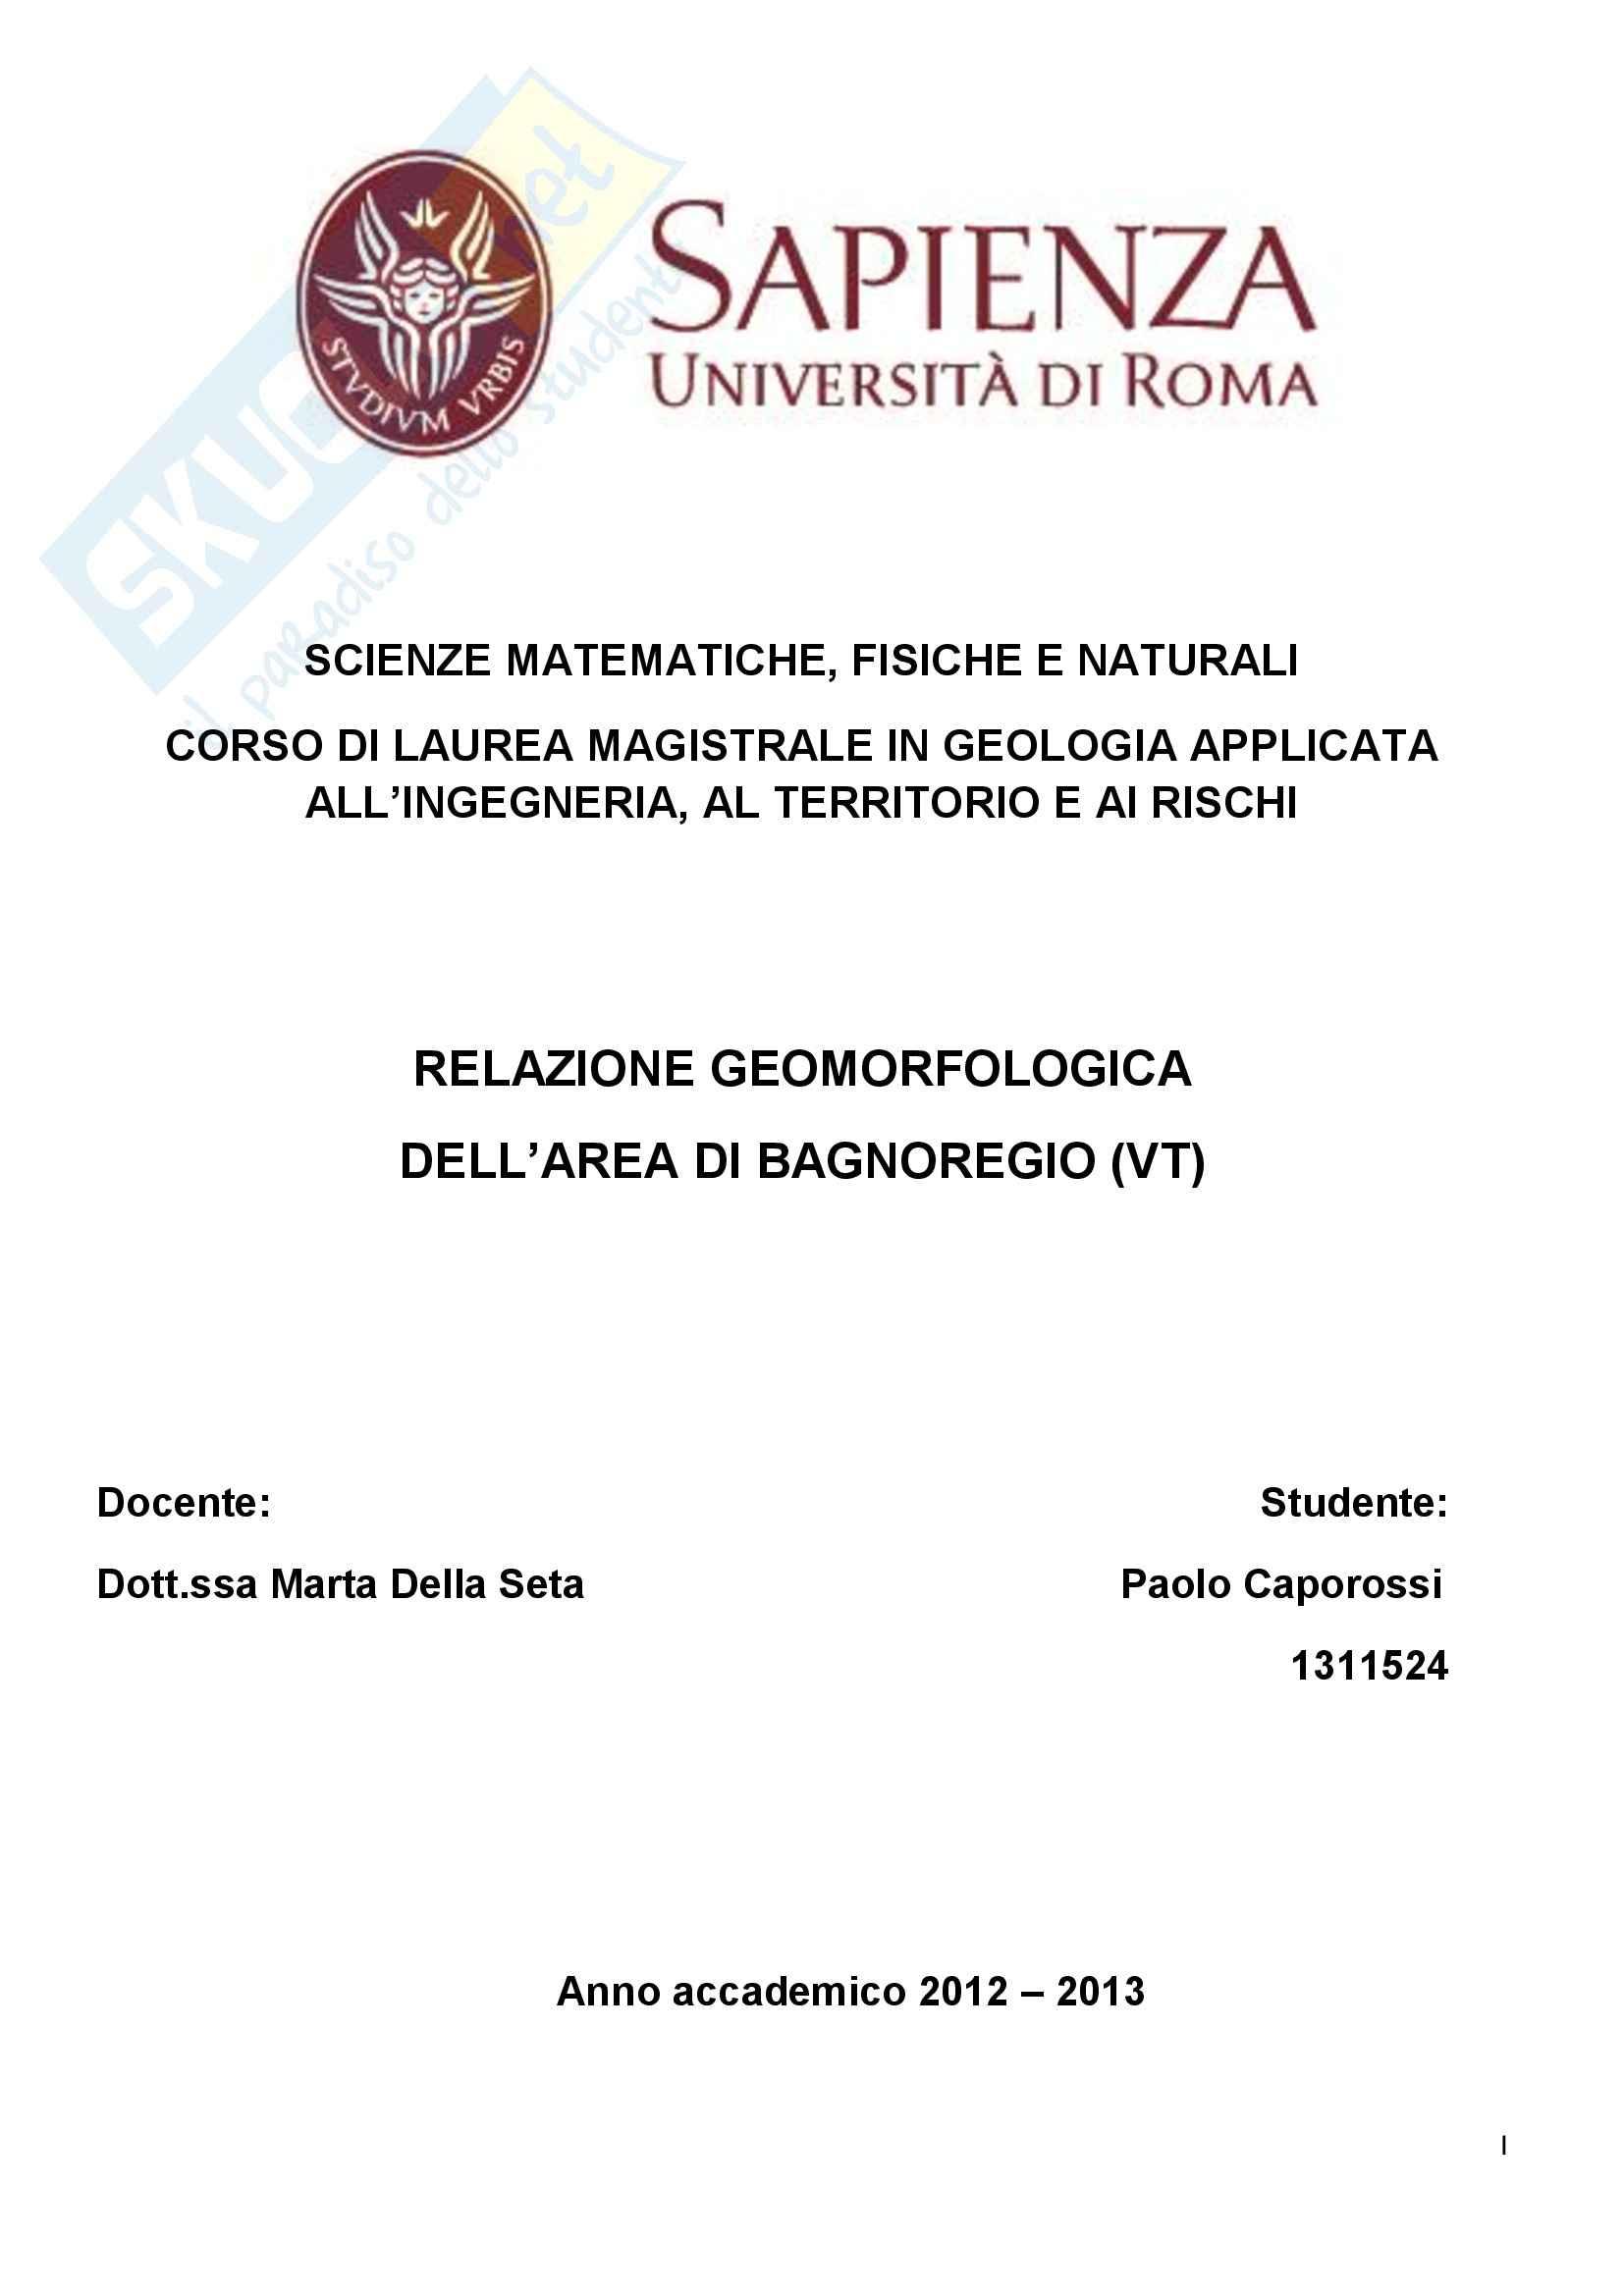 Gemorfologia , Relazione Civita di Bagnoregio (VT) - Tesi